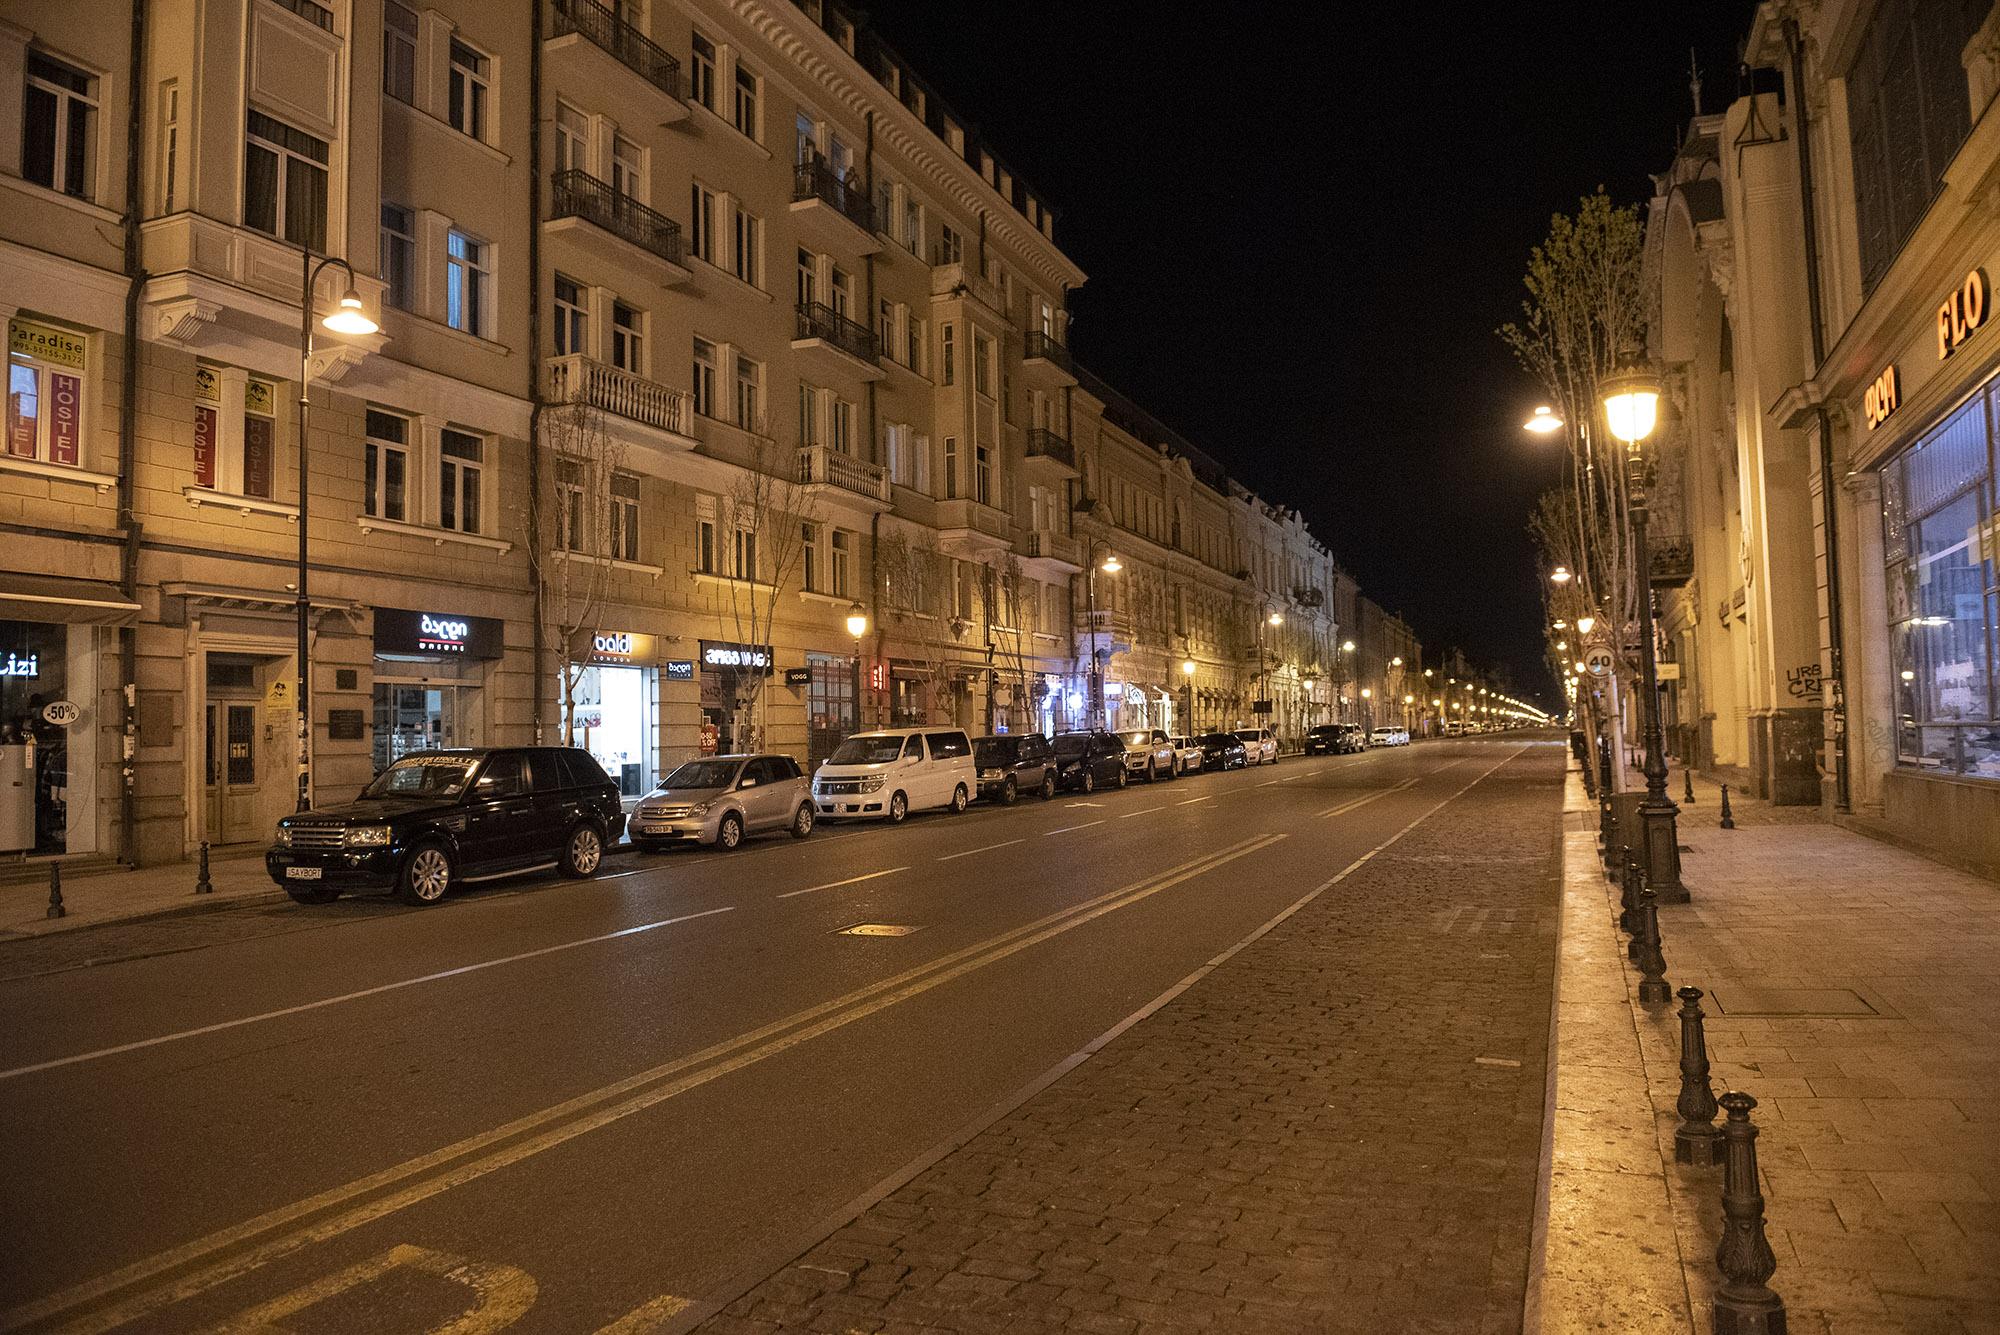 Aghmashenebeli Avenu. Photo: Mariam Nikuradze/OC Media.